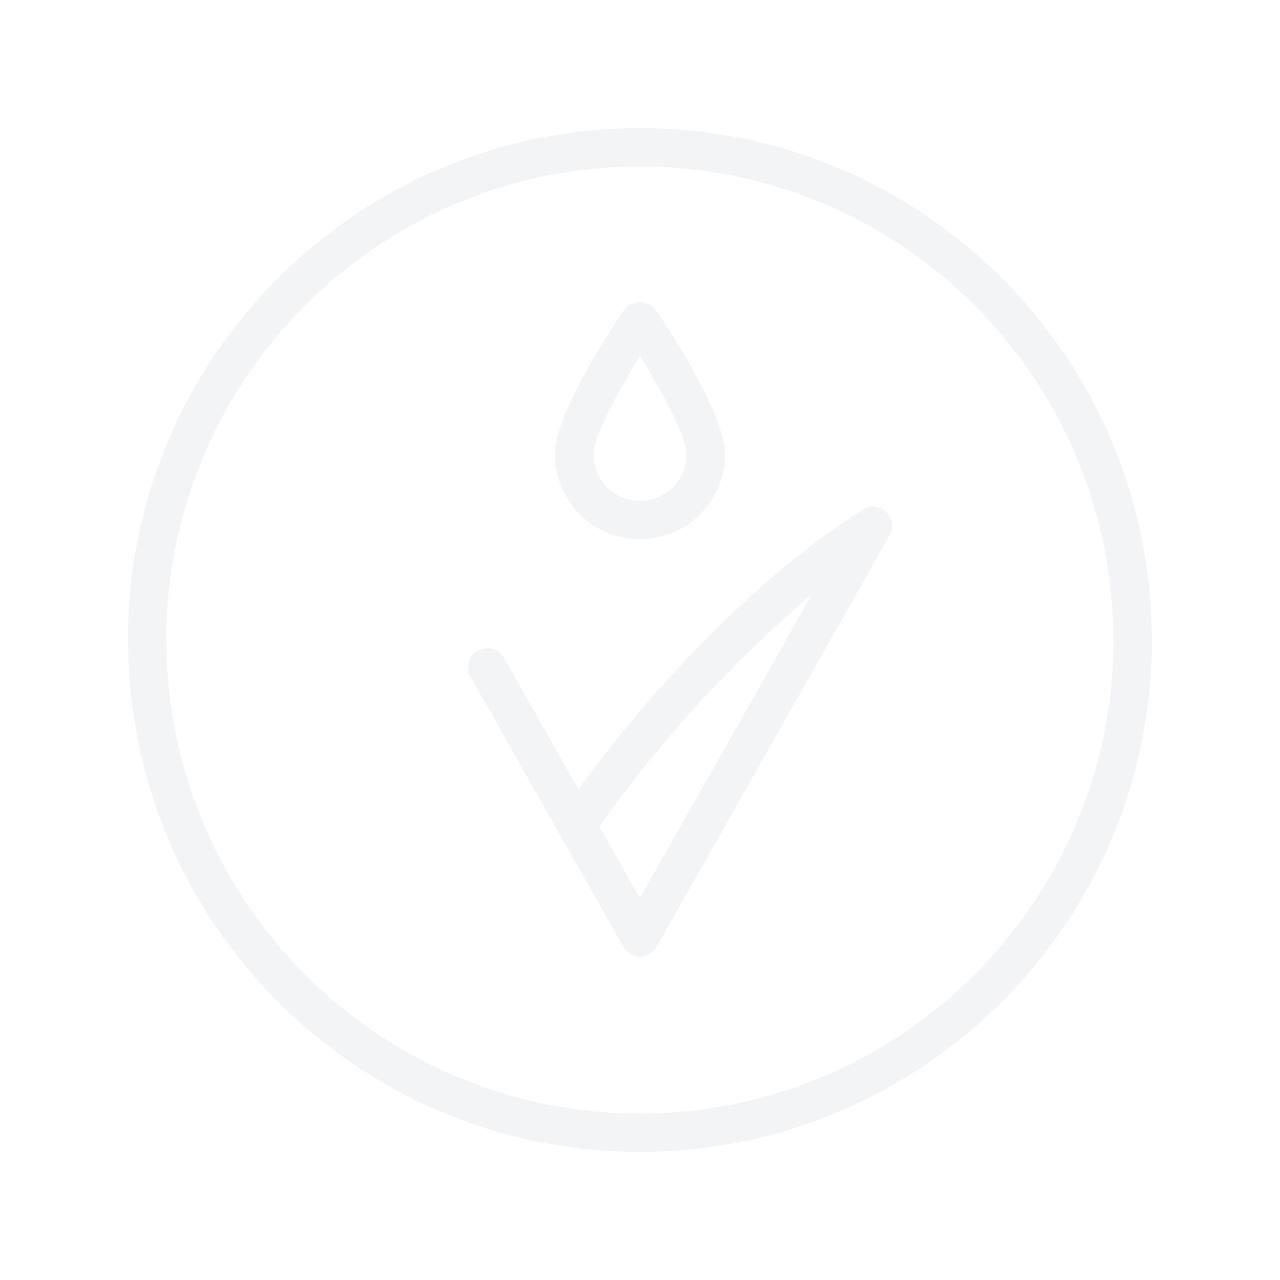 MISSHA Deep Clean Brush Cleanser 100g